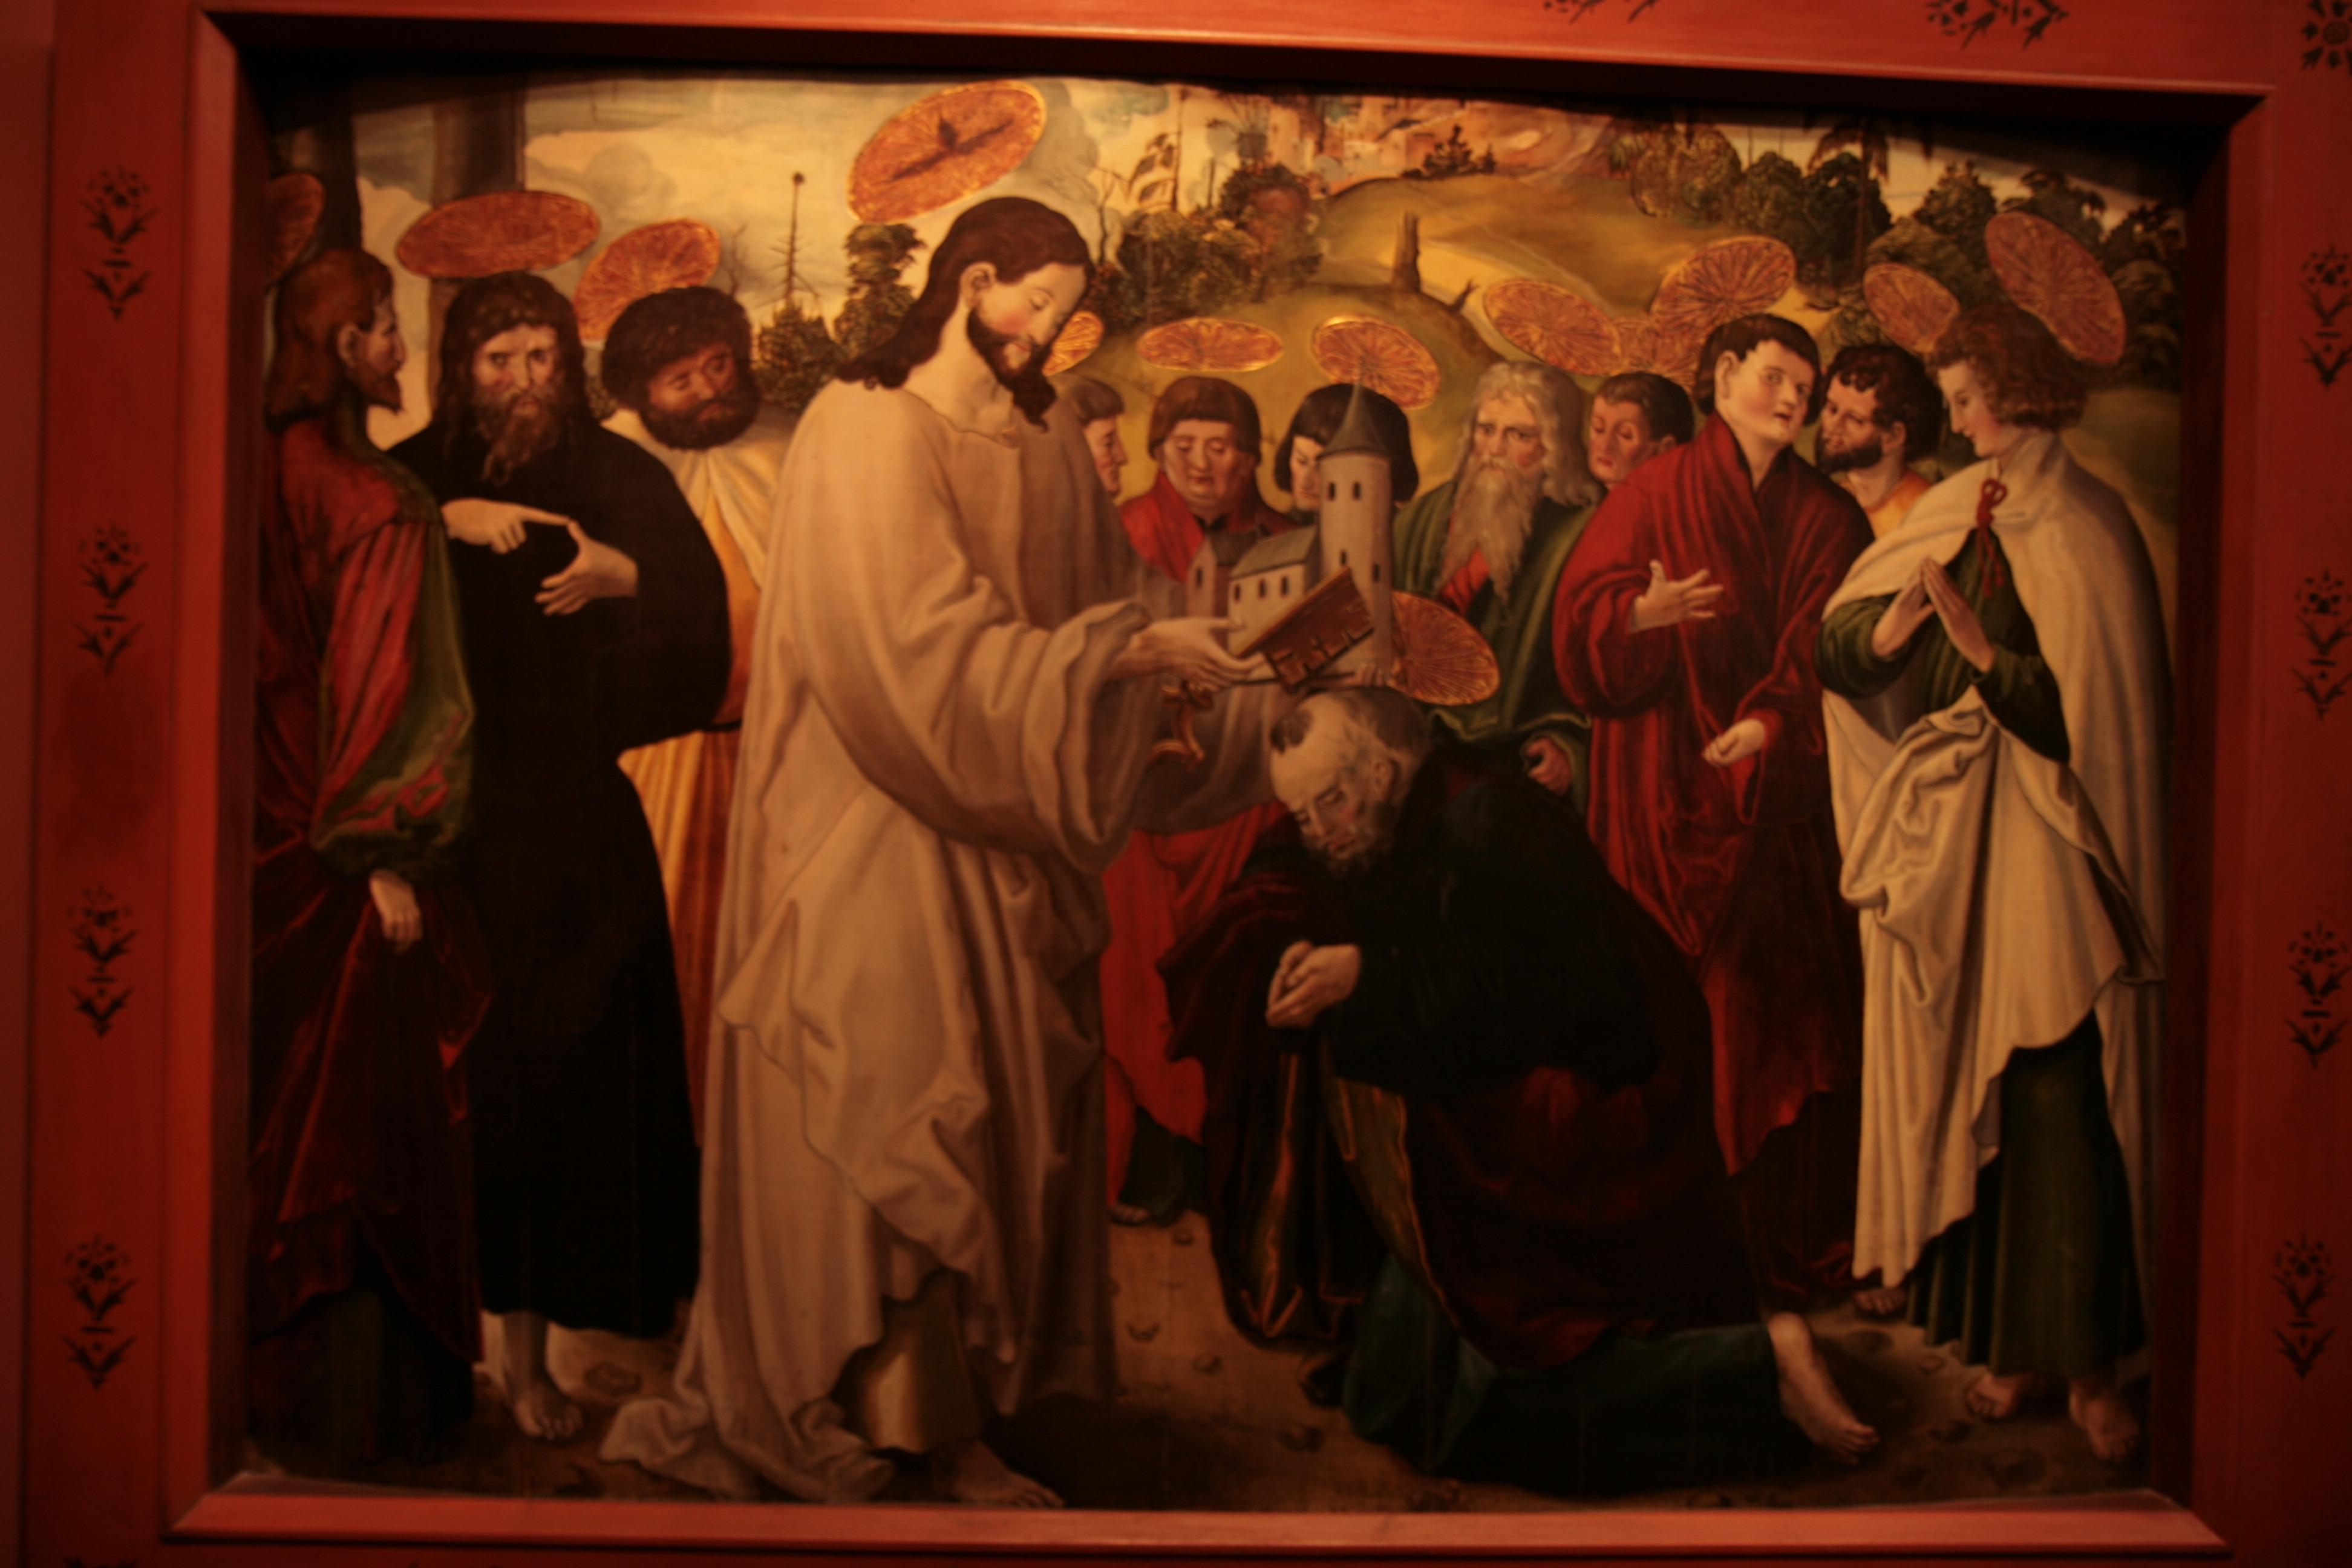 File:Niklaus Manuel Deutch Призвание апостола Петра (1516-1518, Zurich).